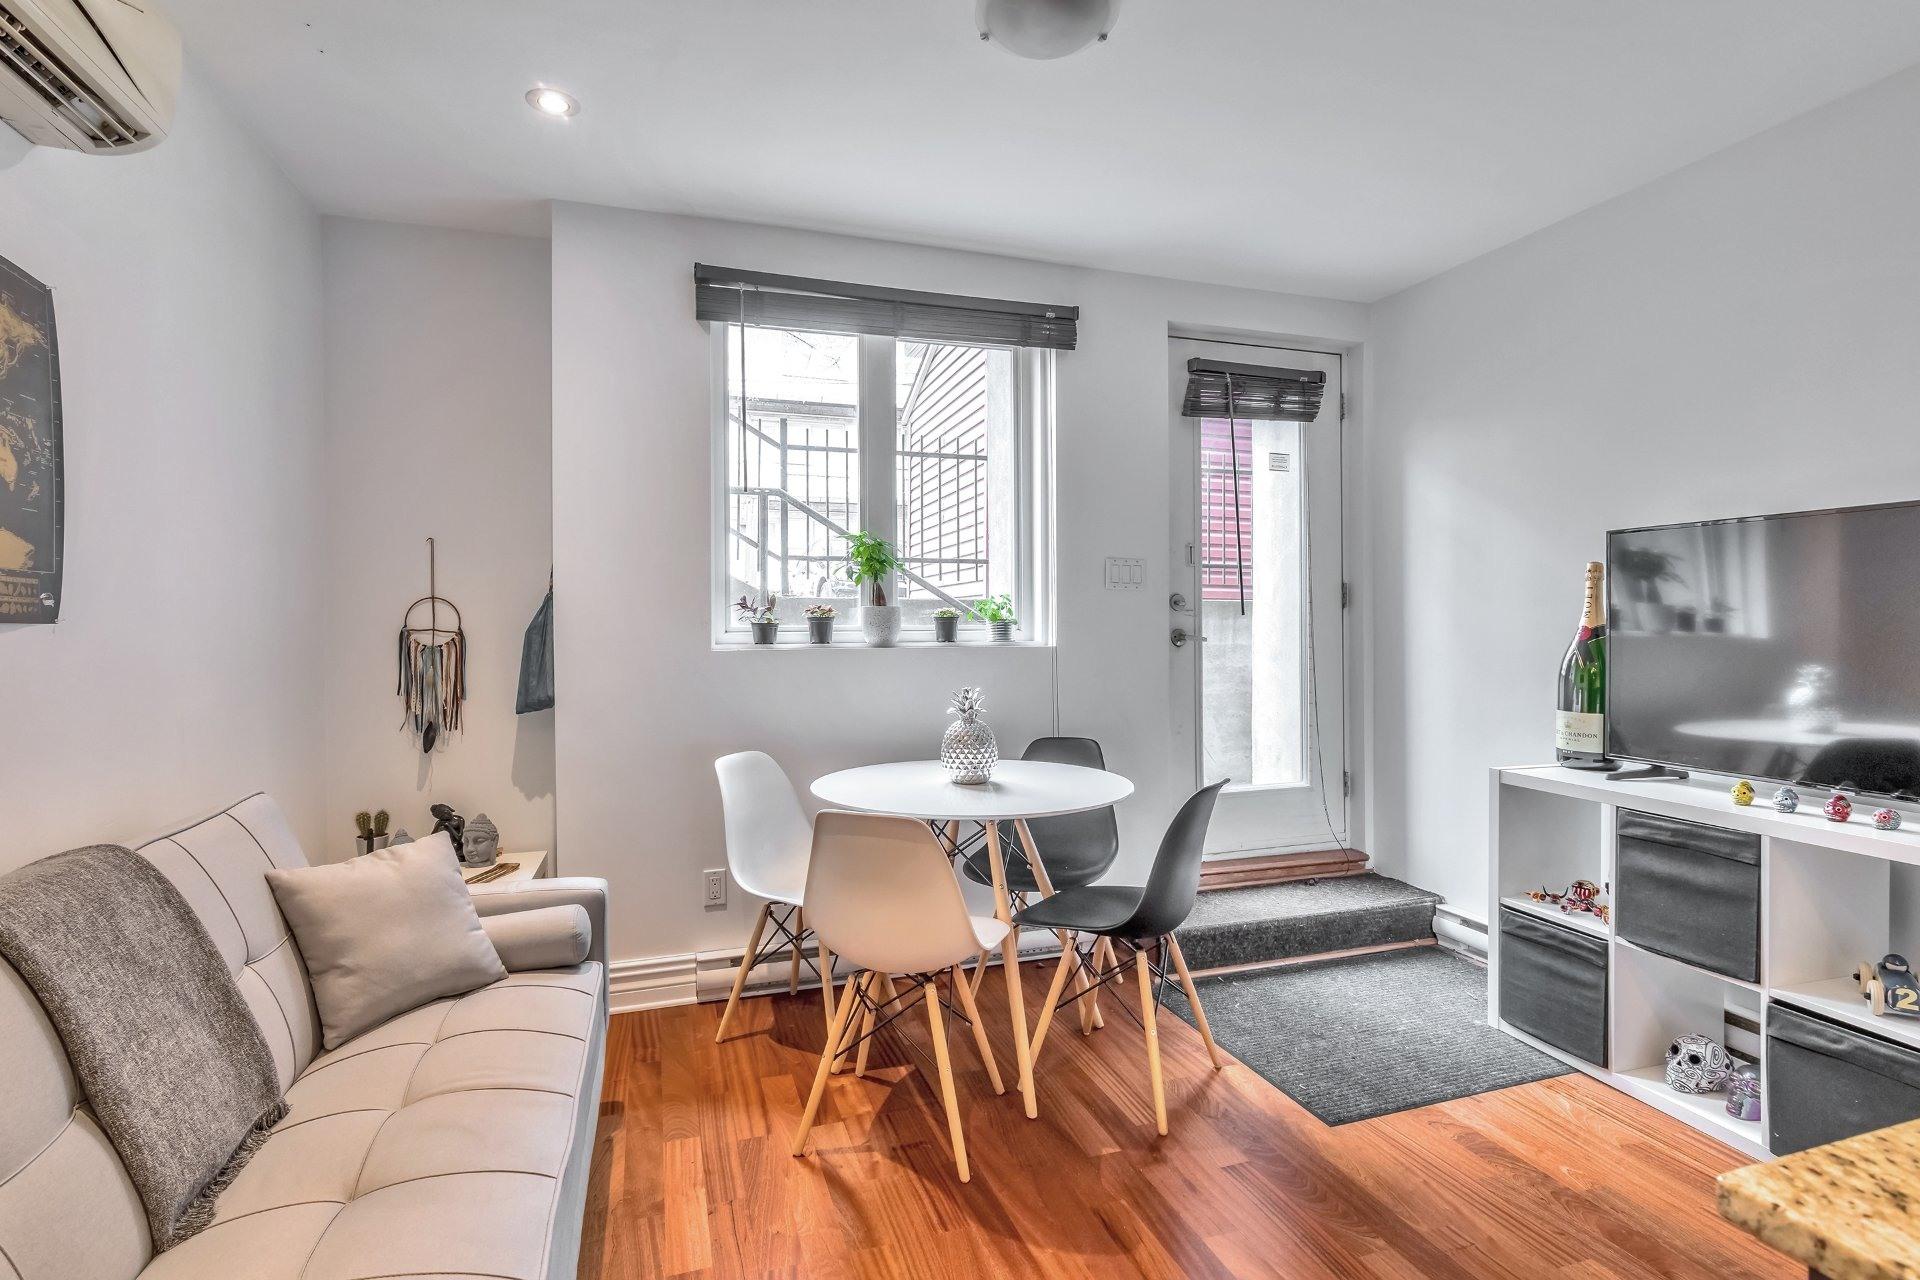 image 3 - Departamento En venta Le Plateau-Mont-Royal Montréal  - 3 habitaciones